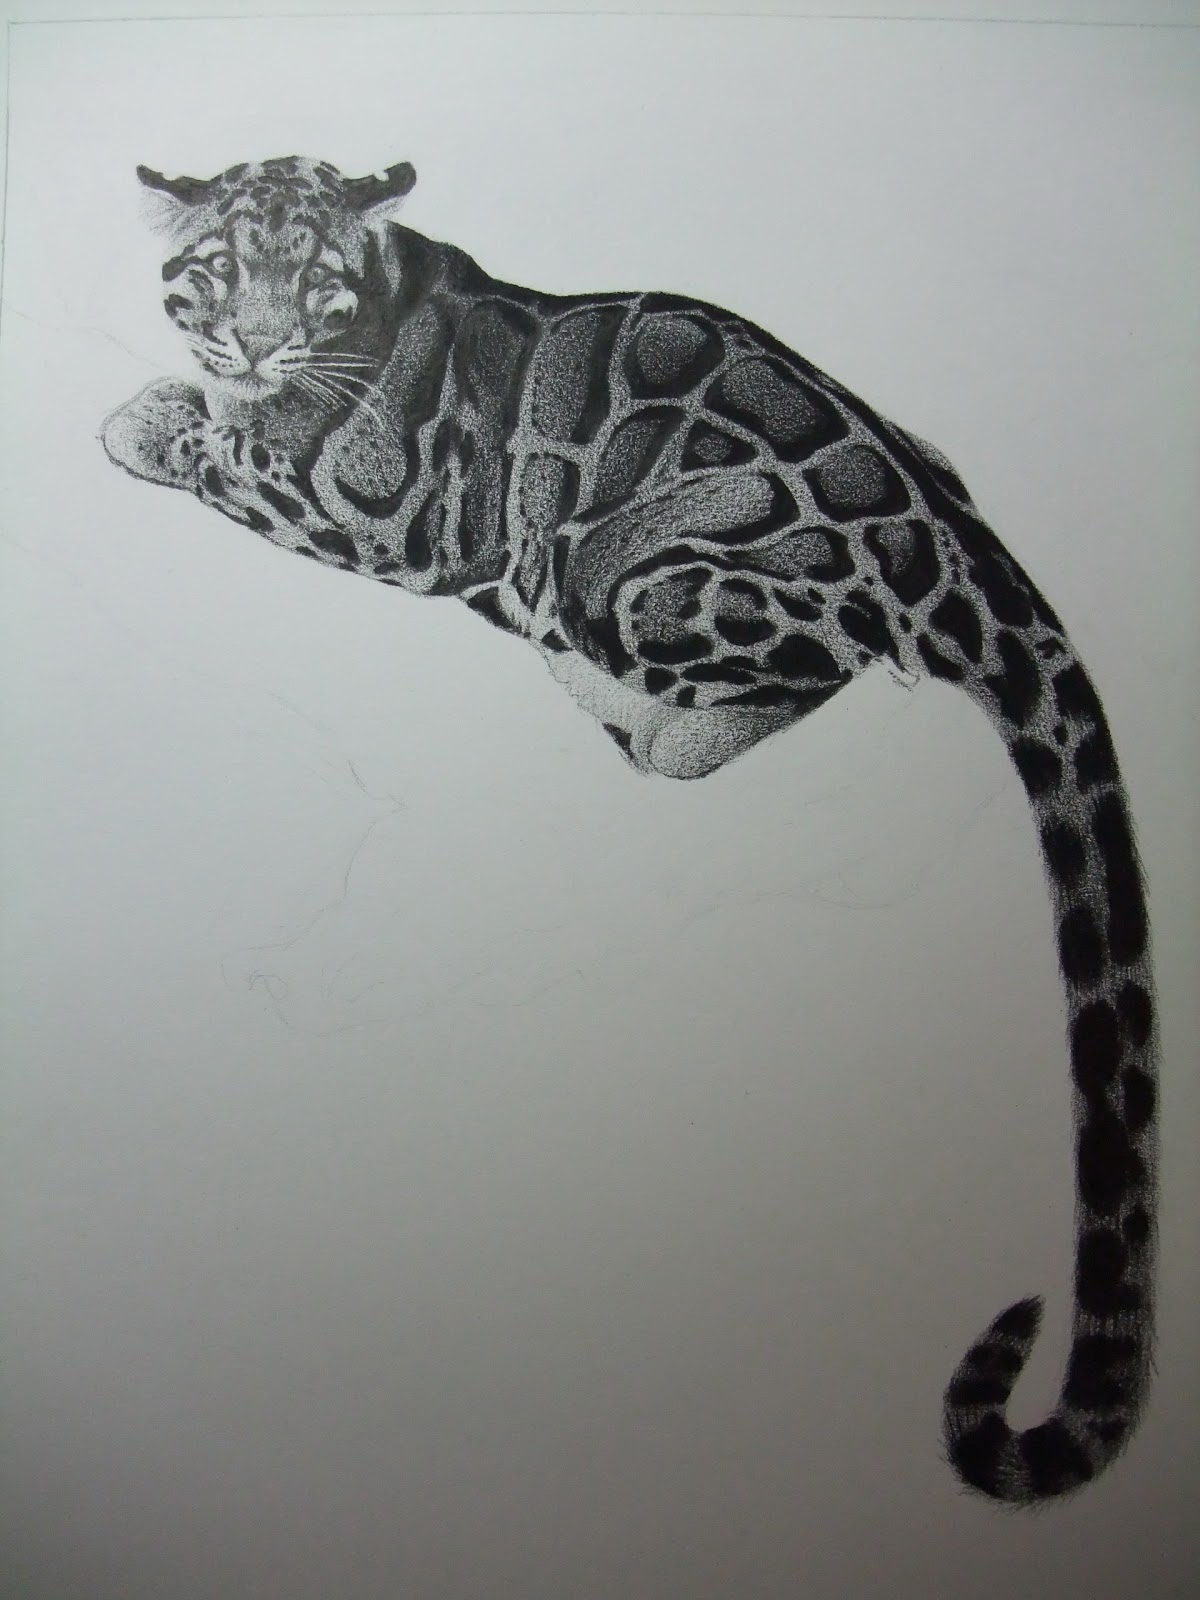 Antoine Roquain Dessin Animalier, Wildlife Pencil Art: Dessin de panthère longibande